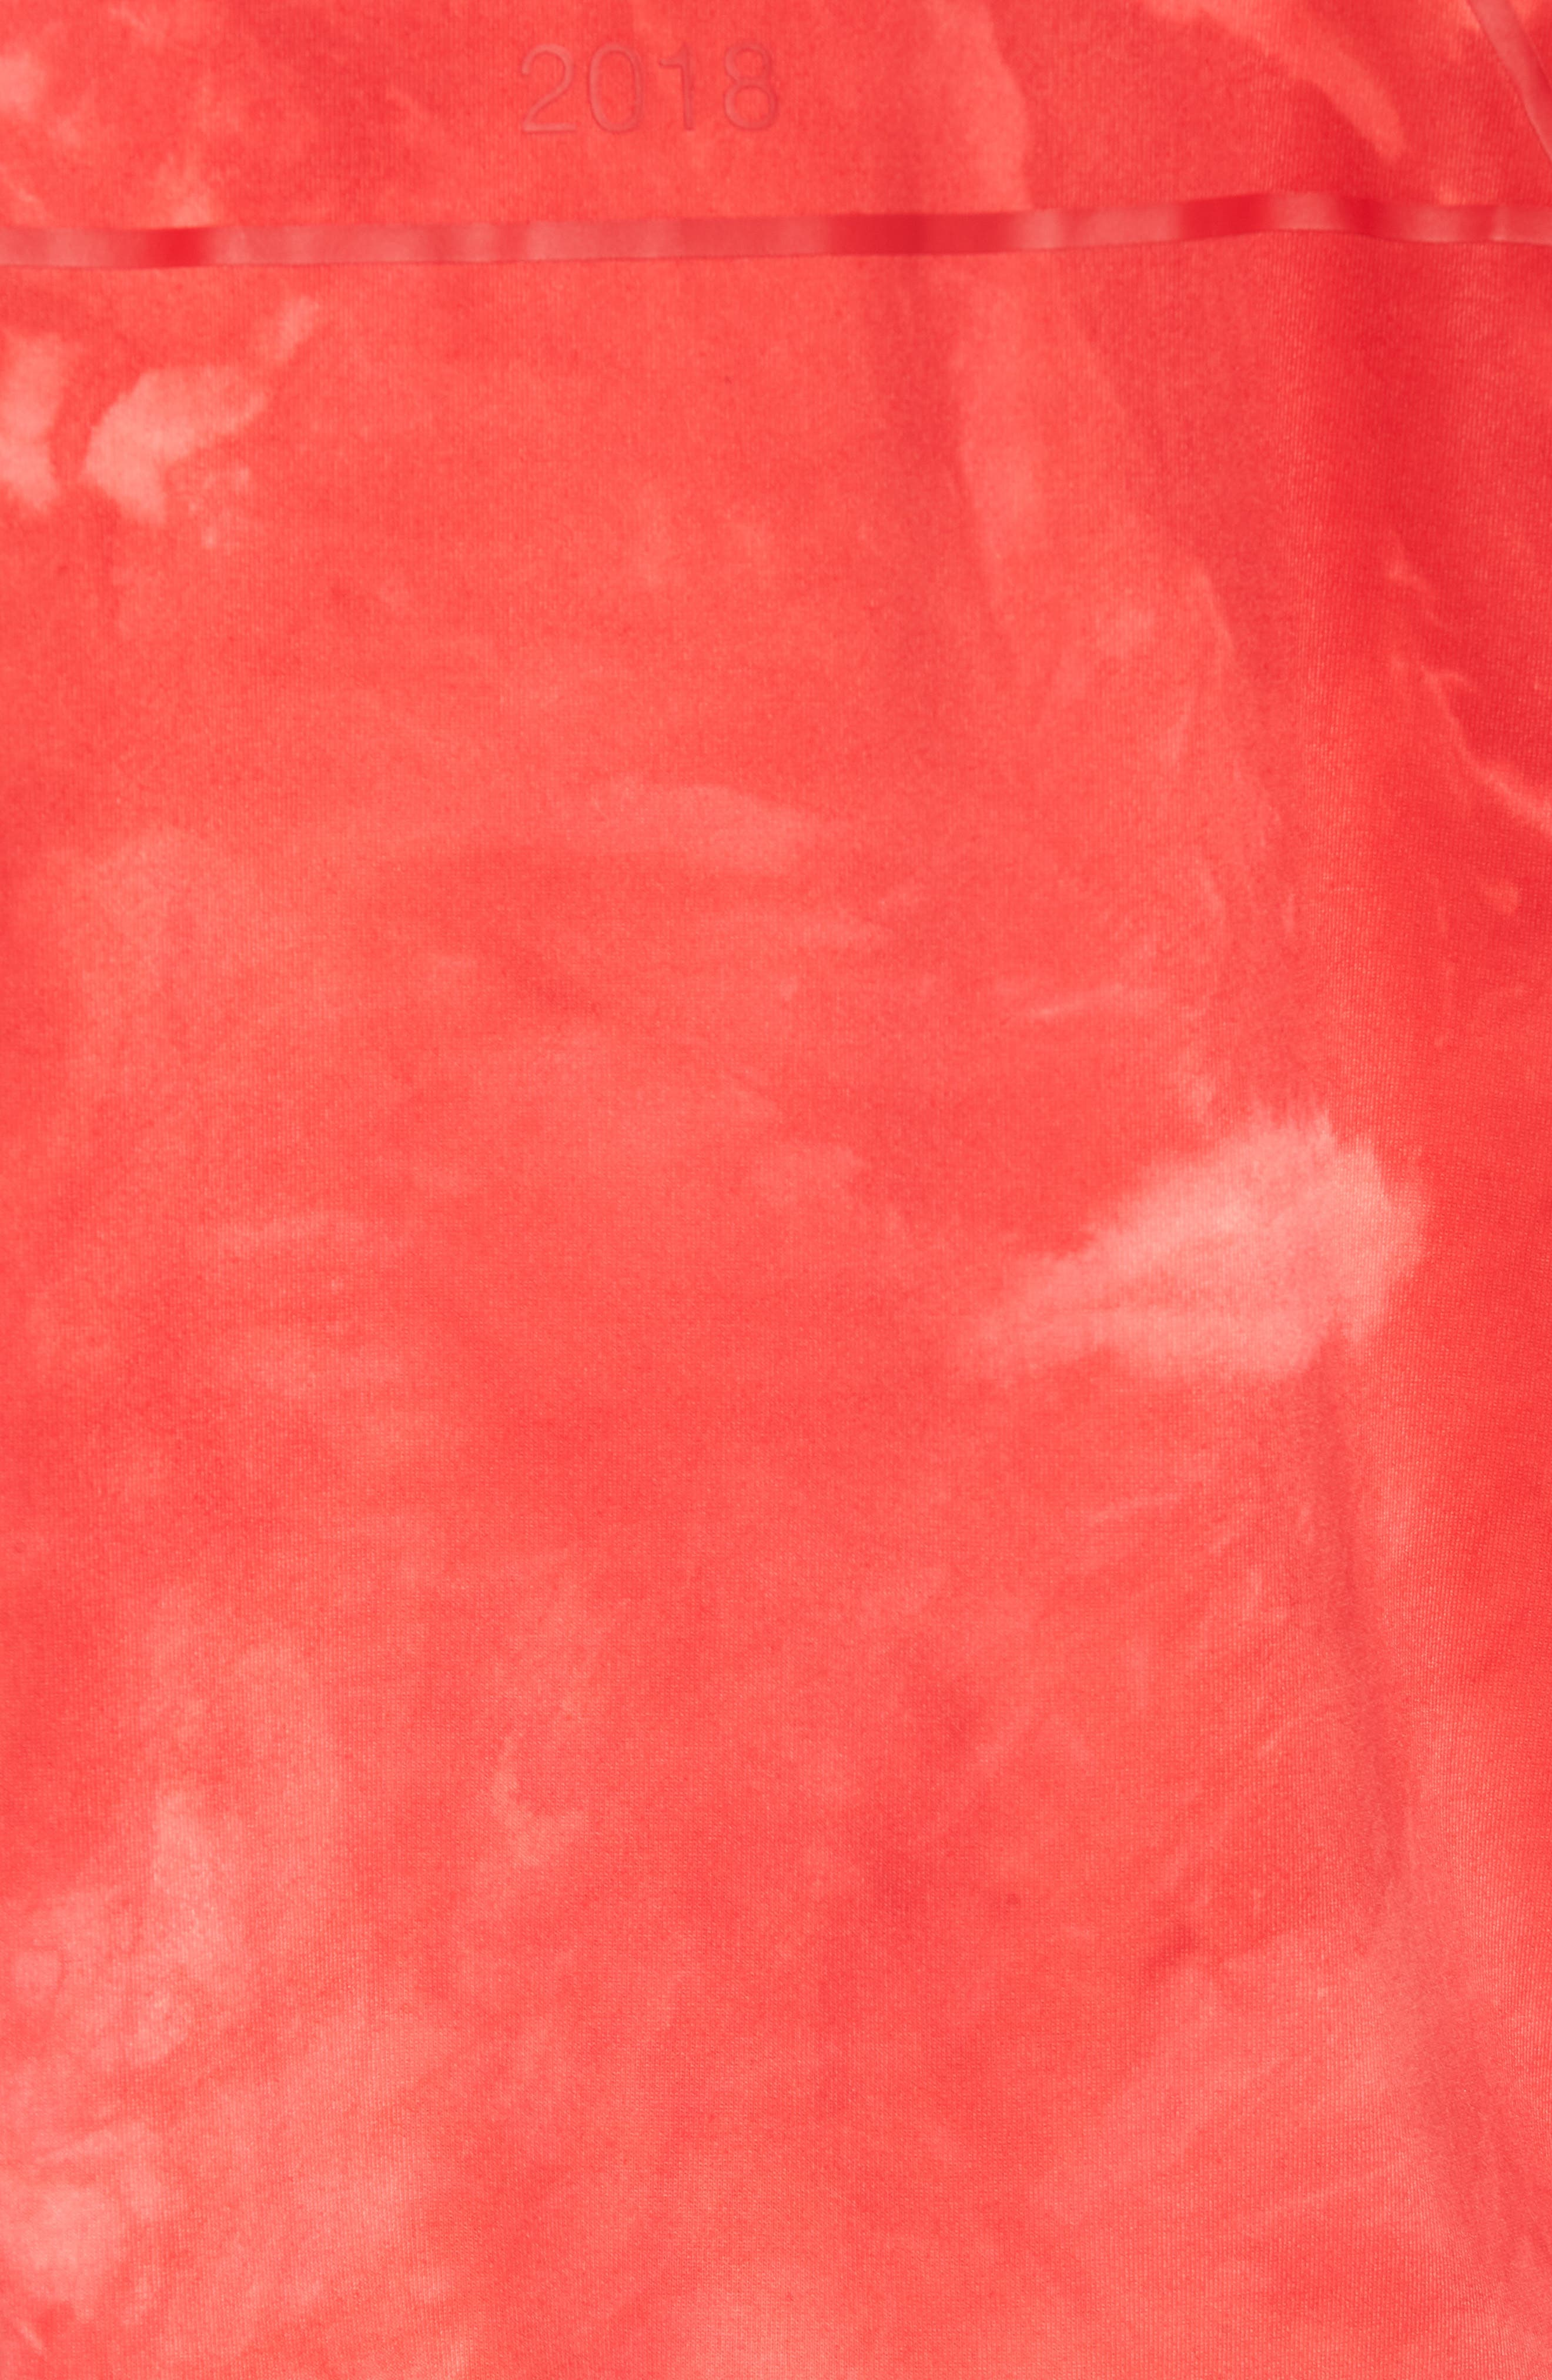 Hu Holi Soccer T-Shirt,                             Alternate thumbnail 5, color,                             Scarlet